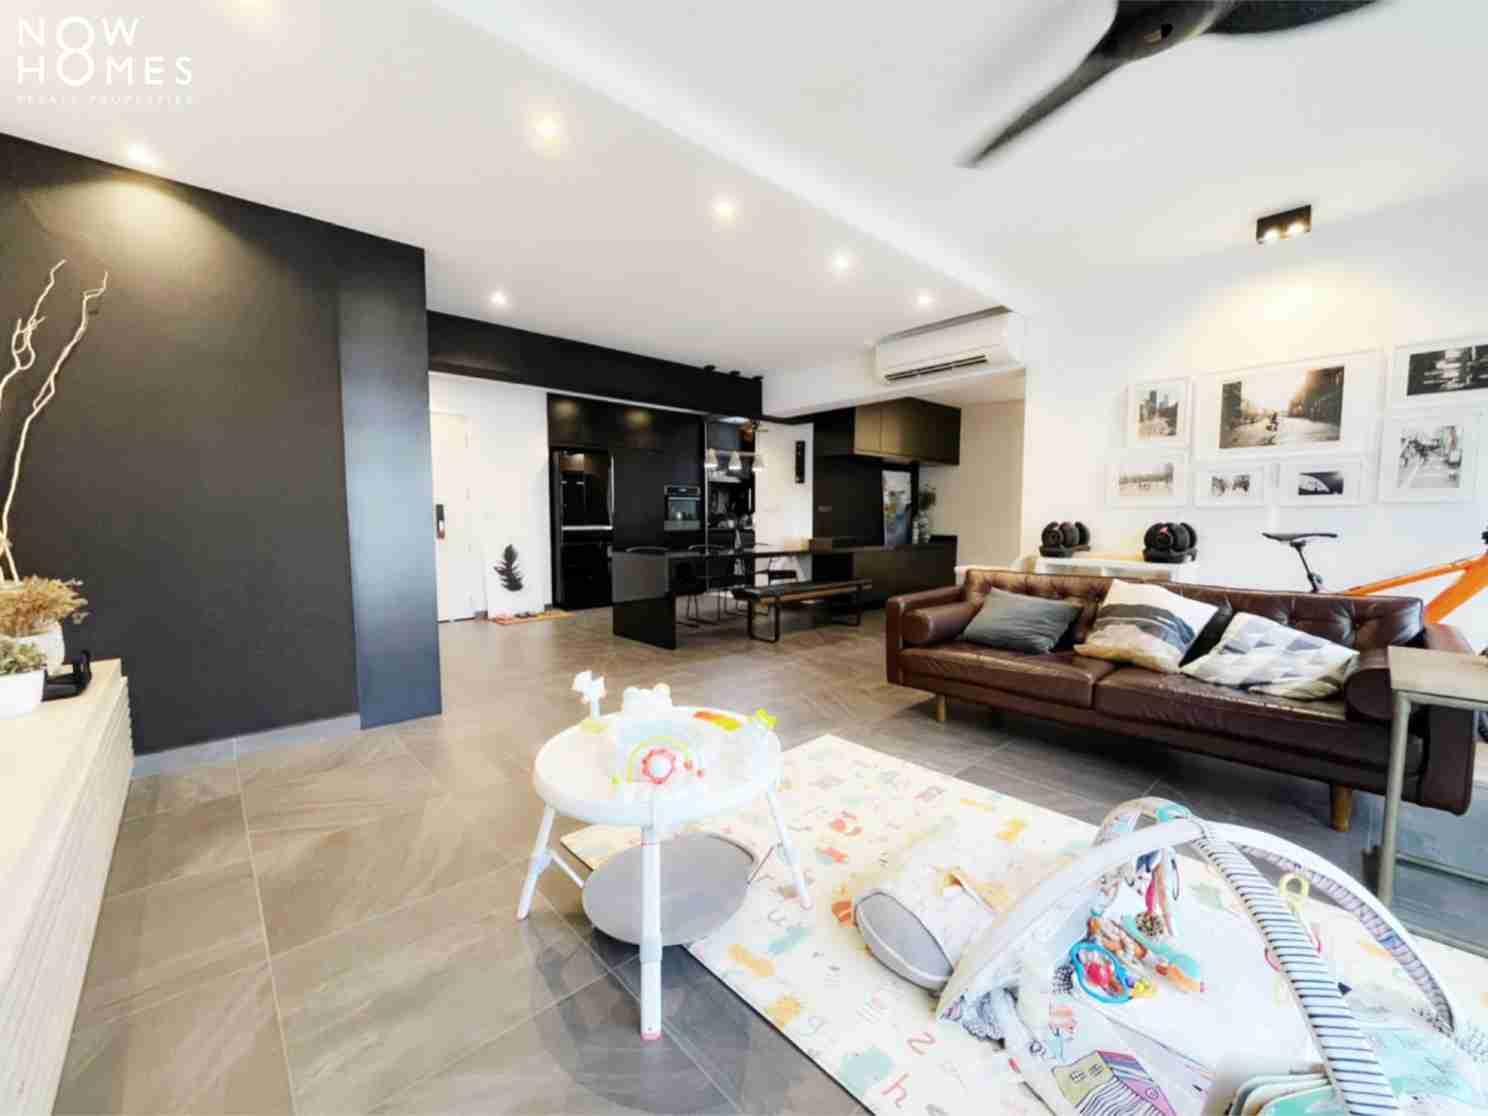 sengkang resale property - 288 compassvale - Living Room side view